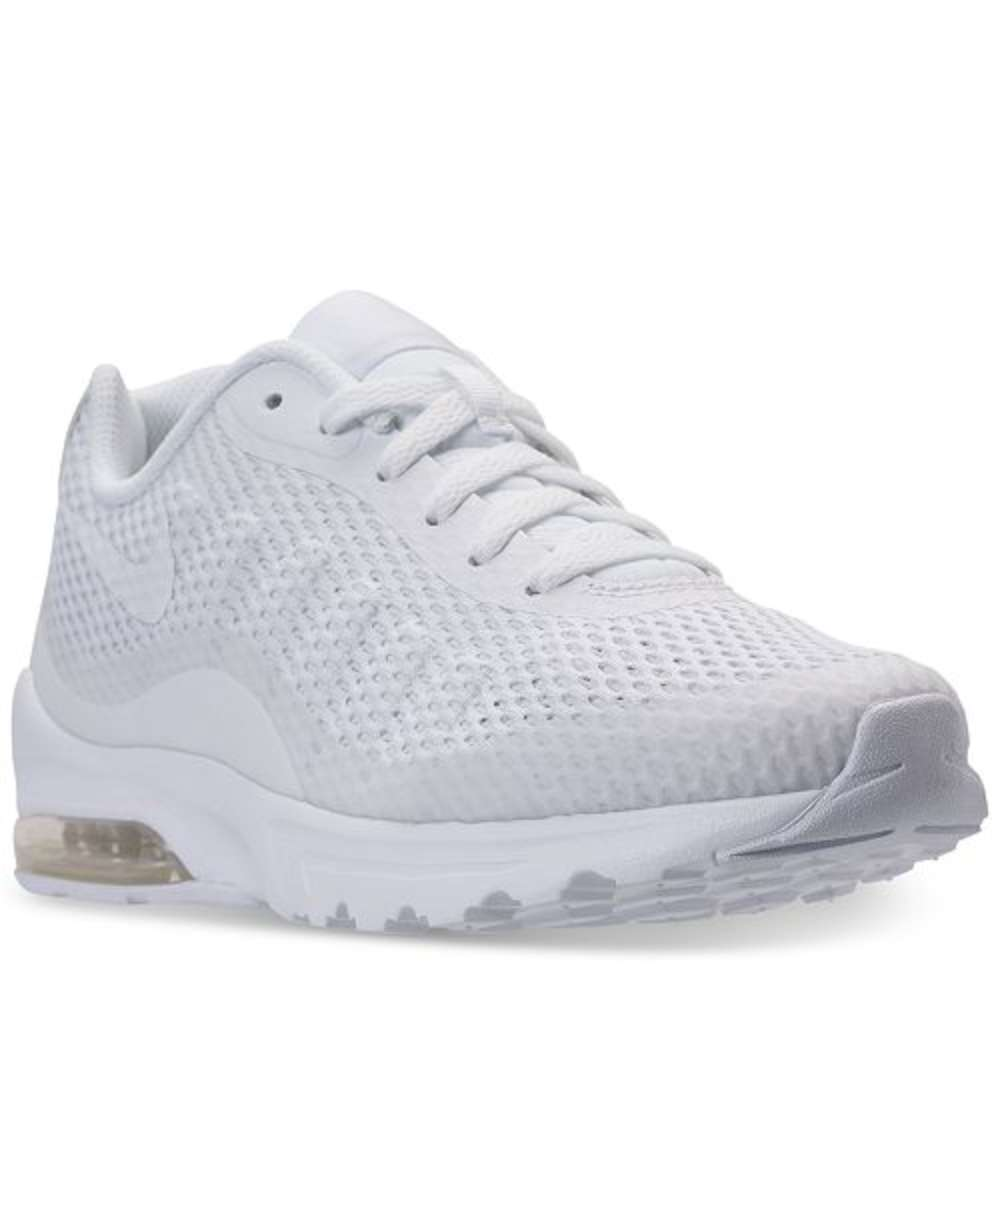 1120a71be01 Nike Air Max Invigor SE Mens Athletic Shoes White   White 10 US ...